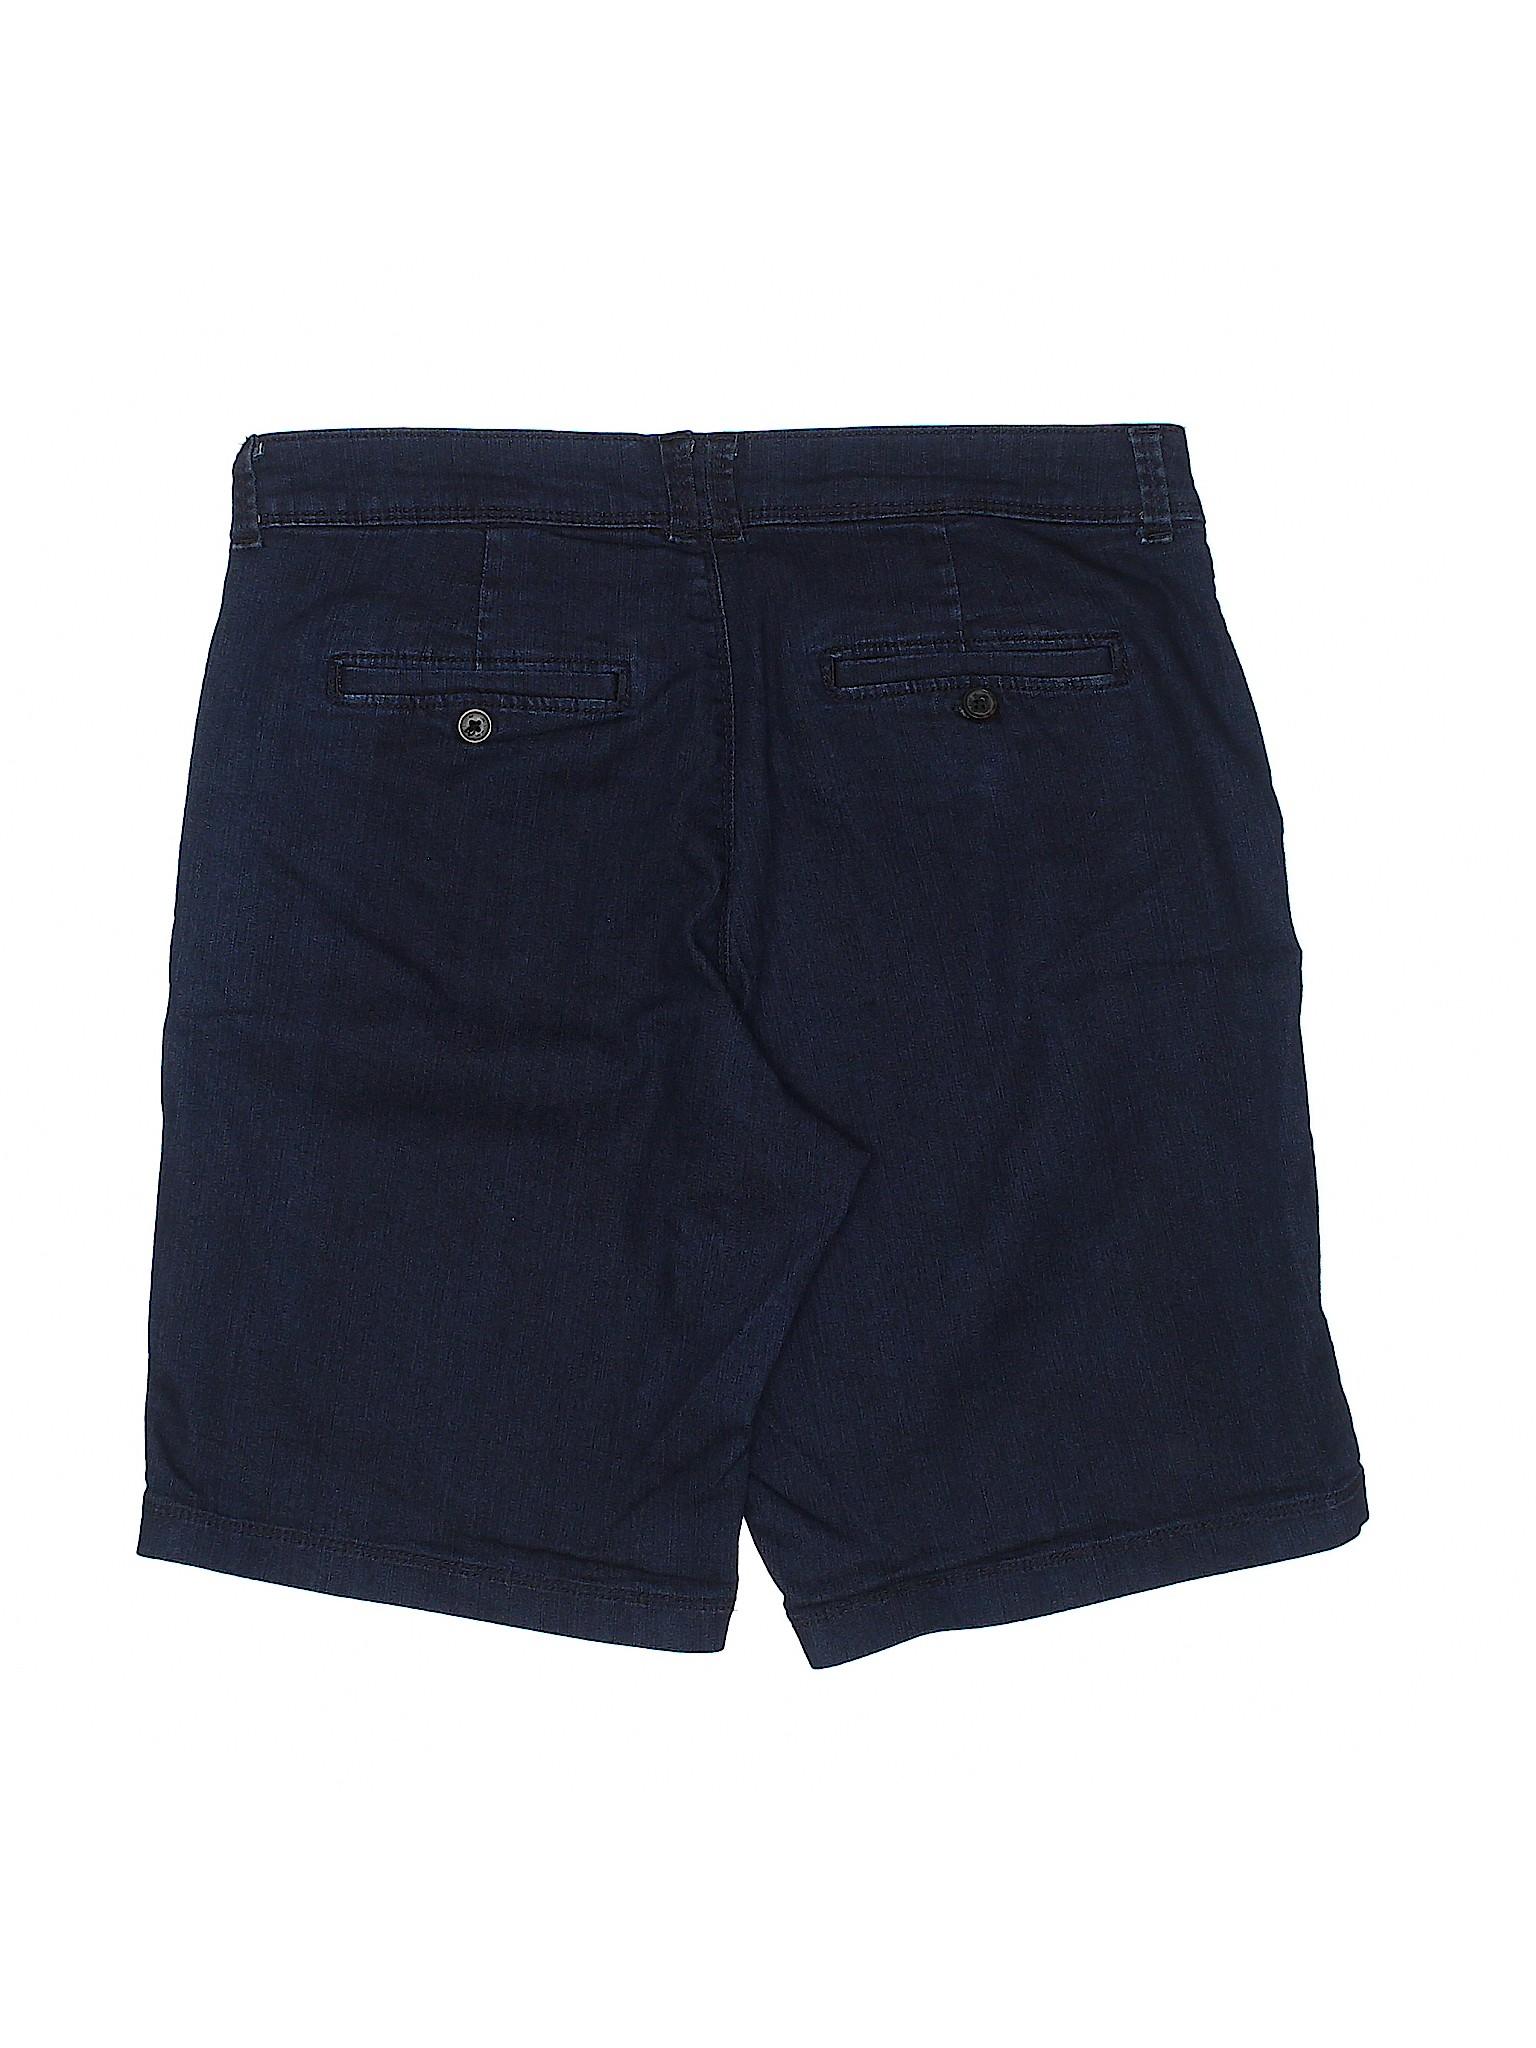 Shorts Shorts Denim Lee Denim Lee Boutique Boutique Lee Boutique Shorts Denim 4InqHxw45